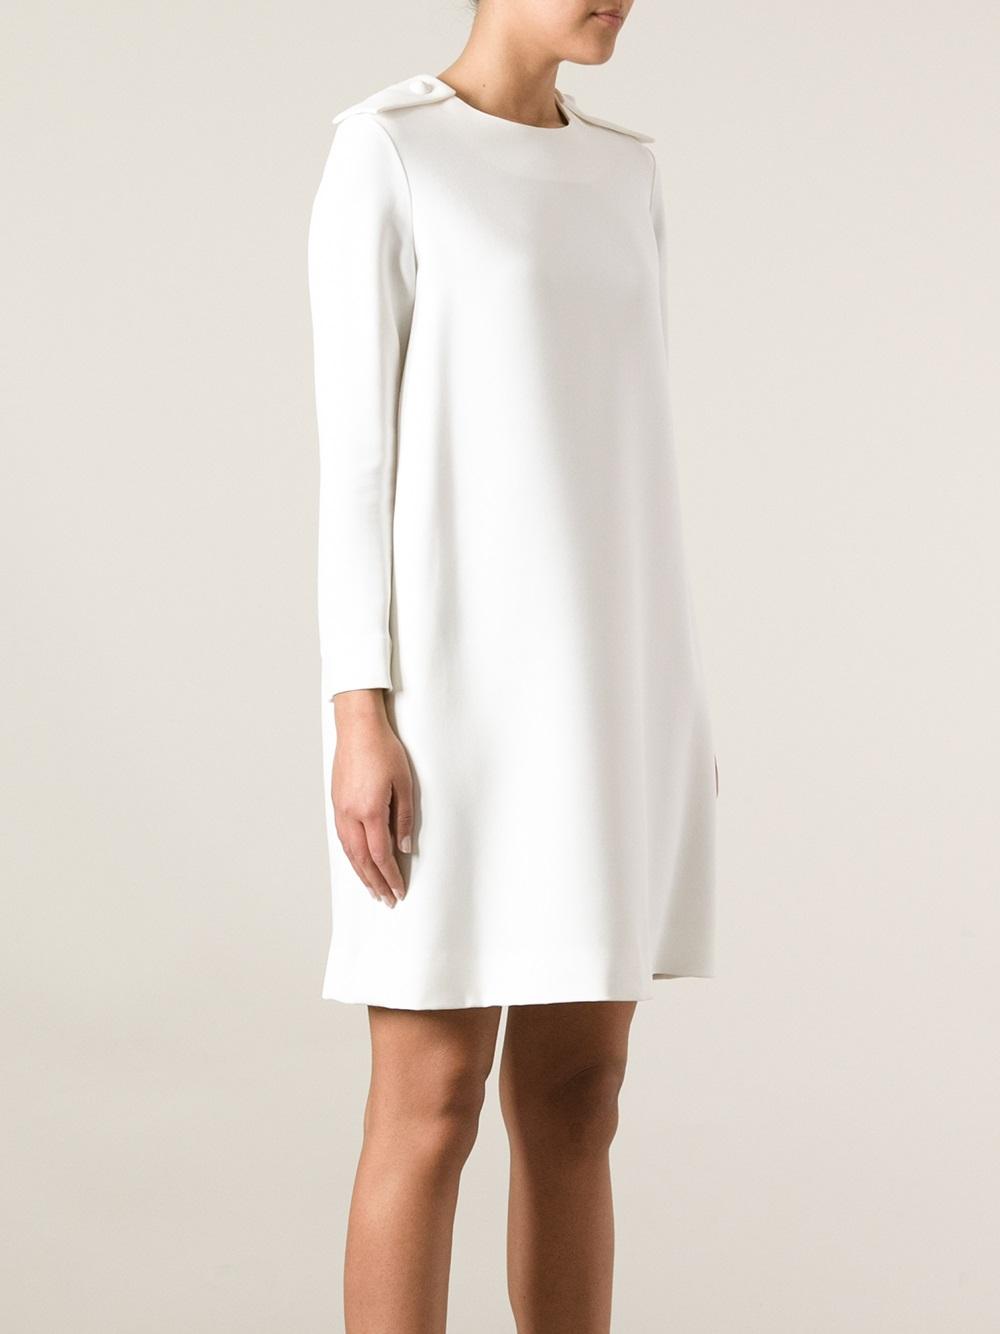 69241071b2 Chloé White Long Sleeve Dress